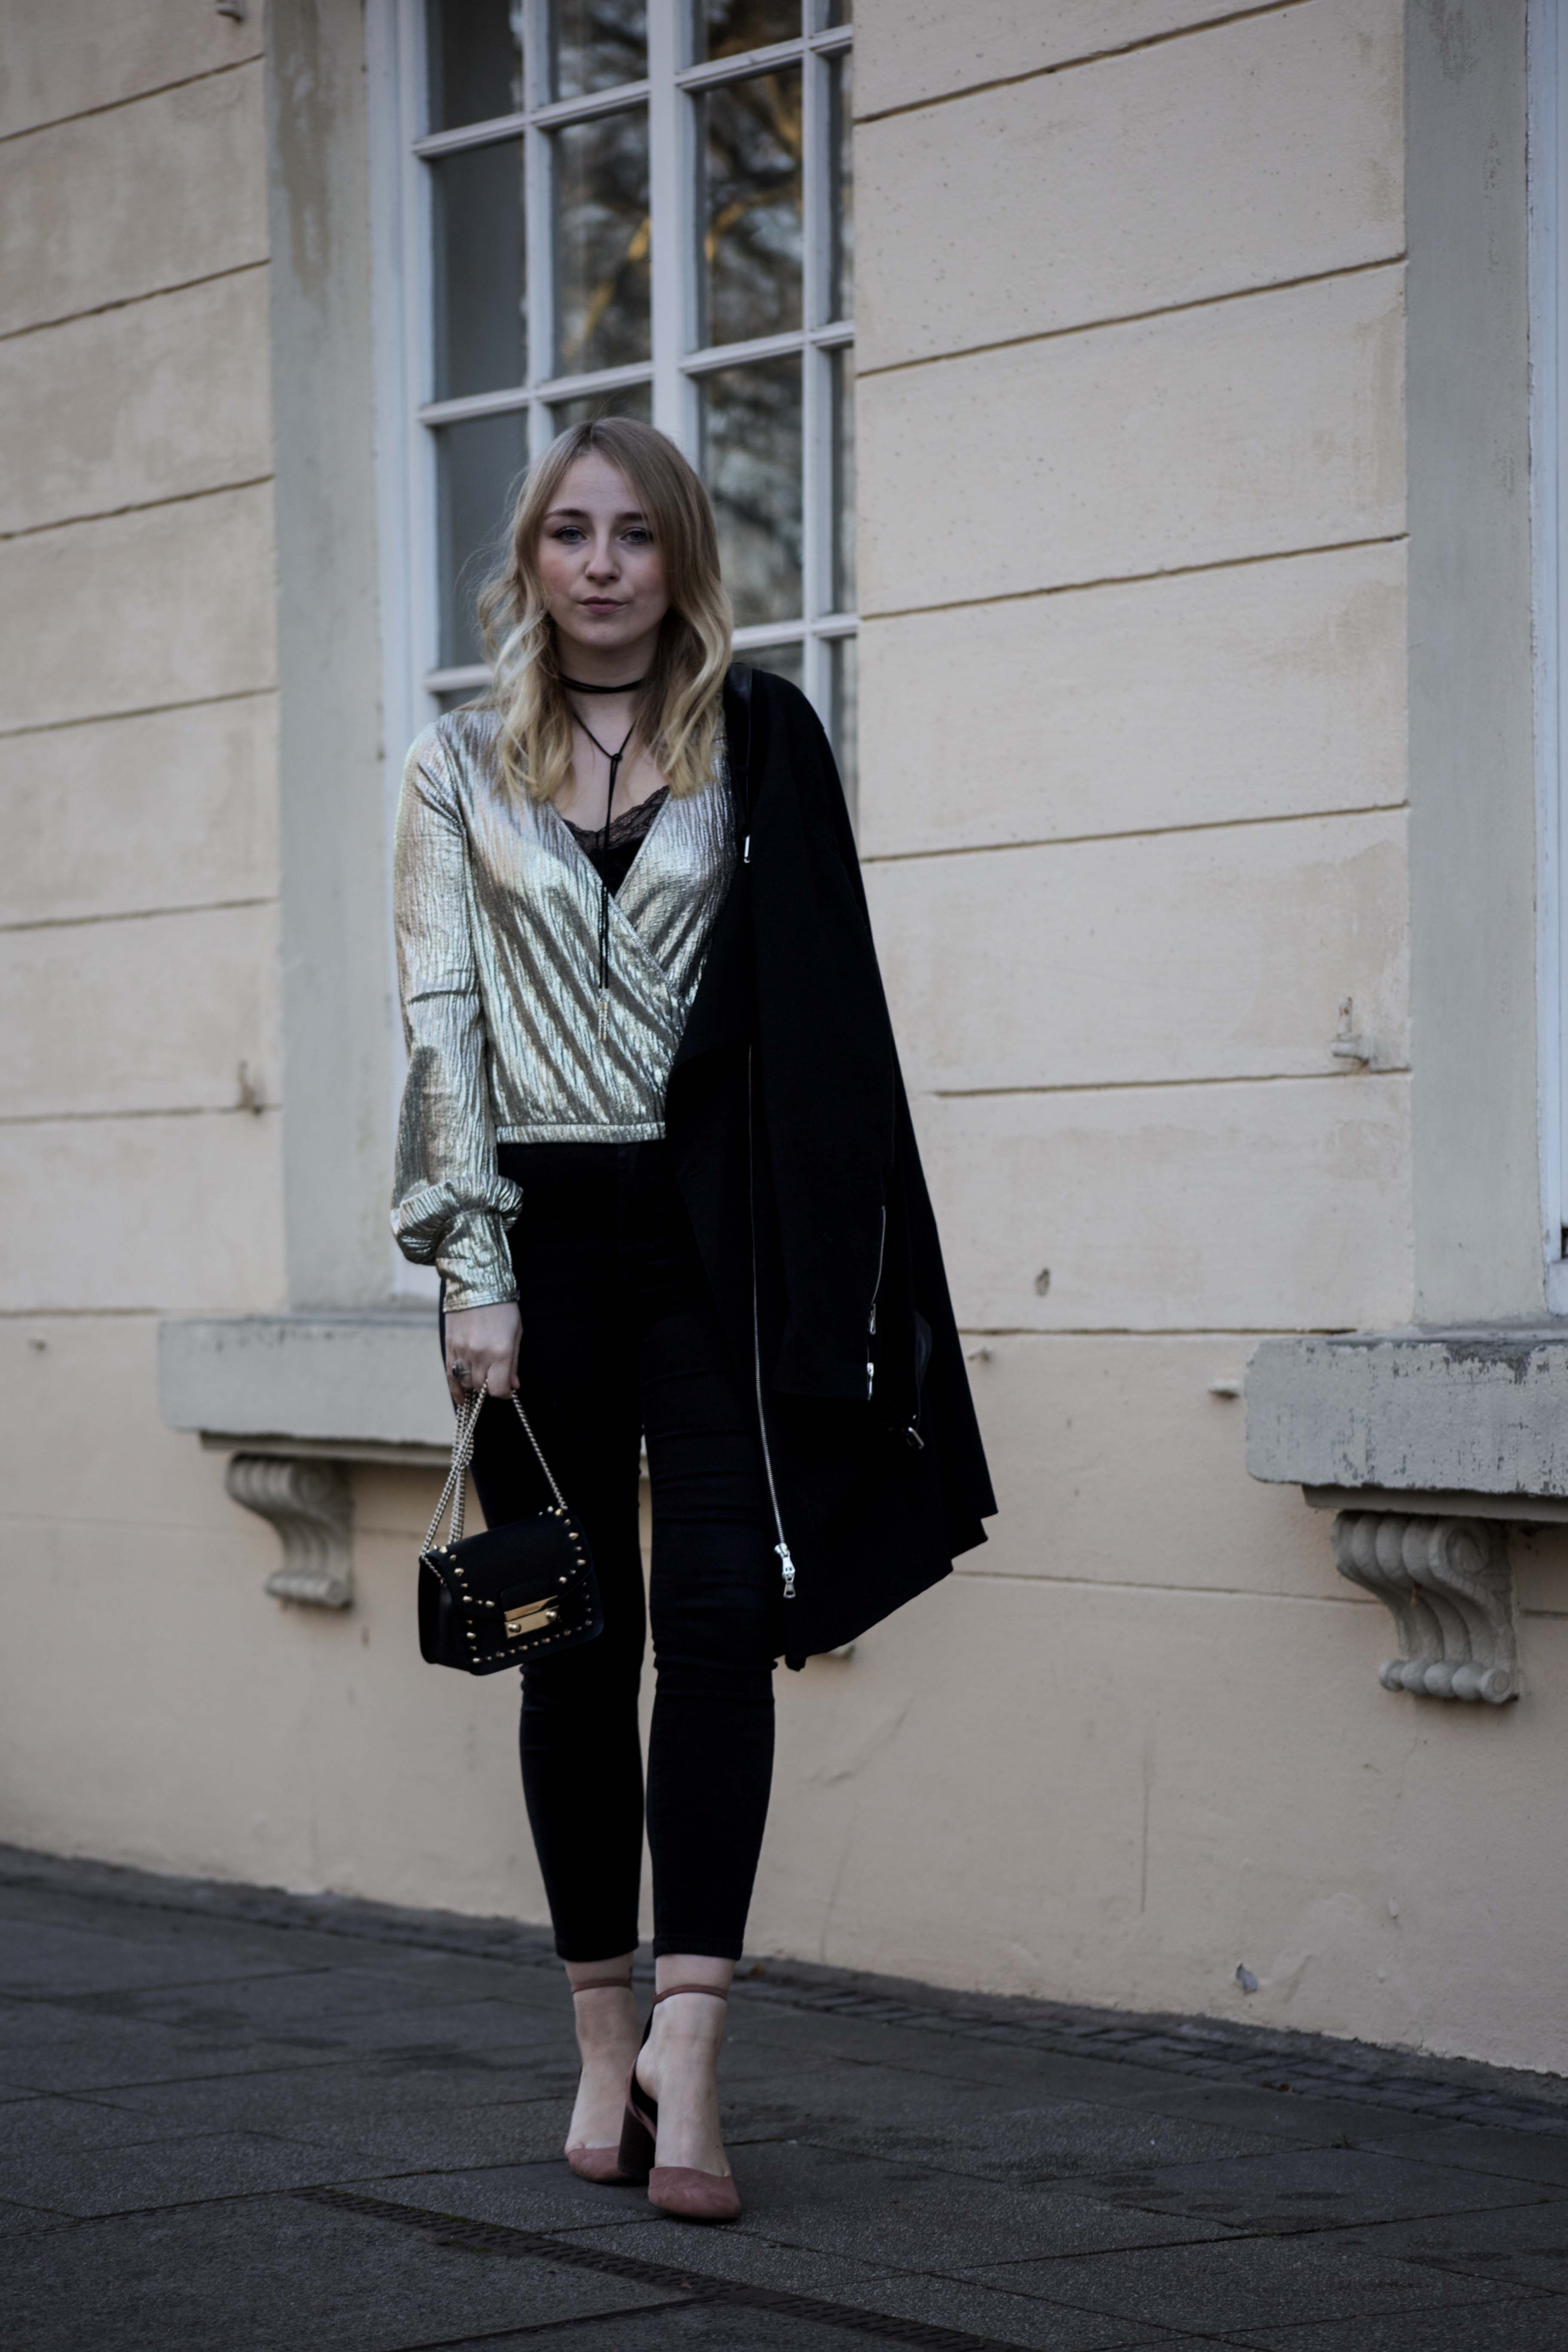 last-minute-silvester-outfit-fashionblog-modeblog-koeln-berlin_0541